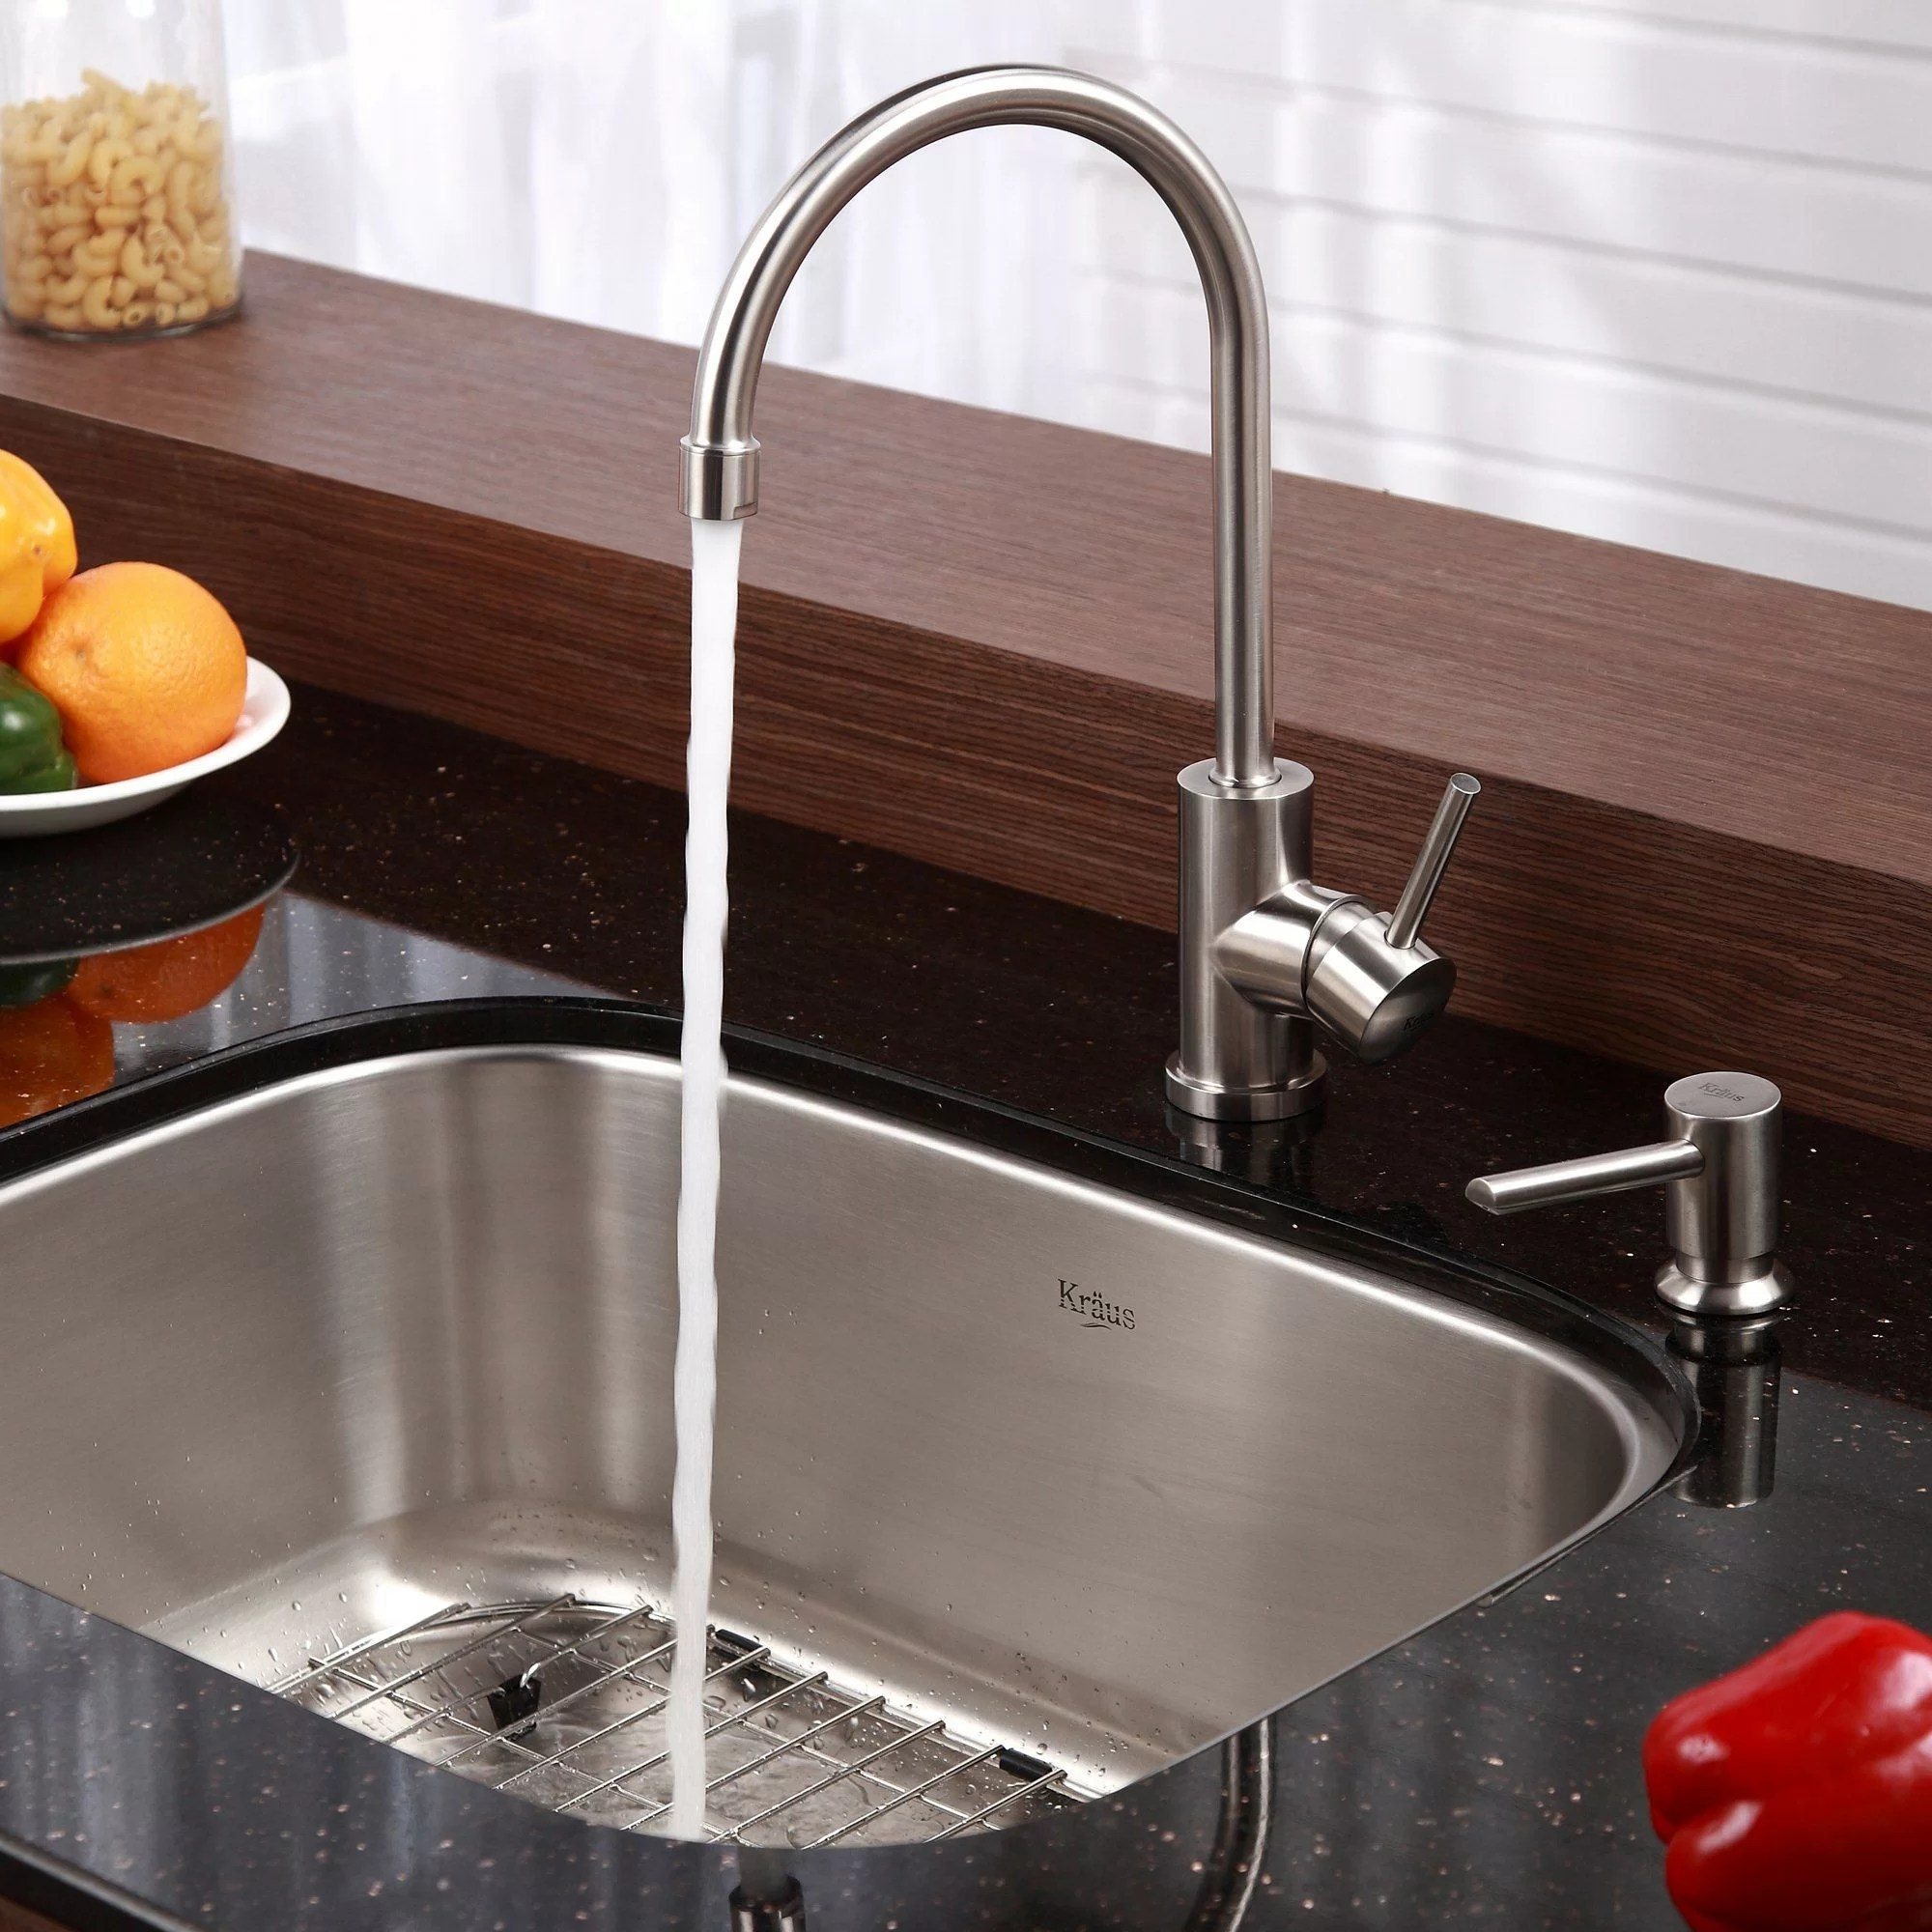 best undermount kitchen sinks aid mixers kraus stainless steel 23 quot x 17 6 single bowl